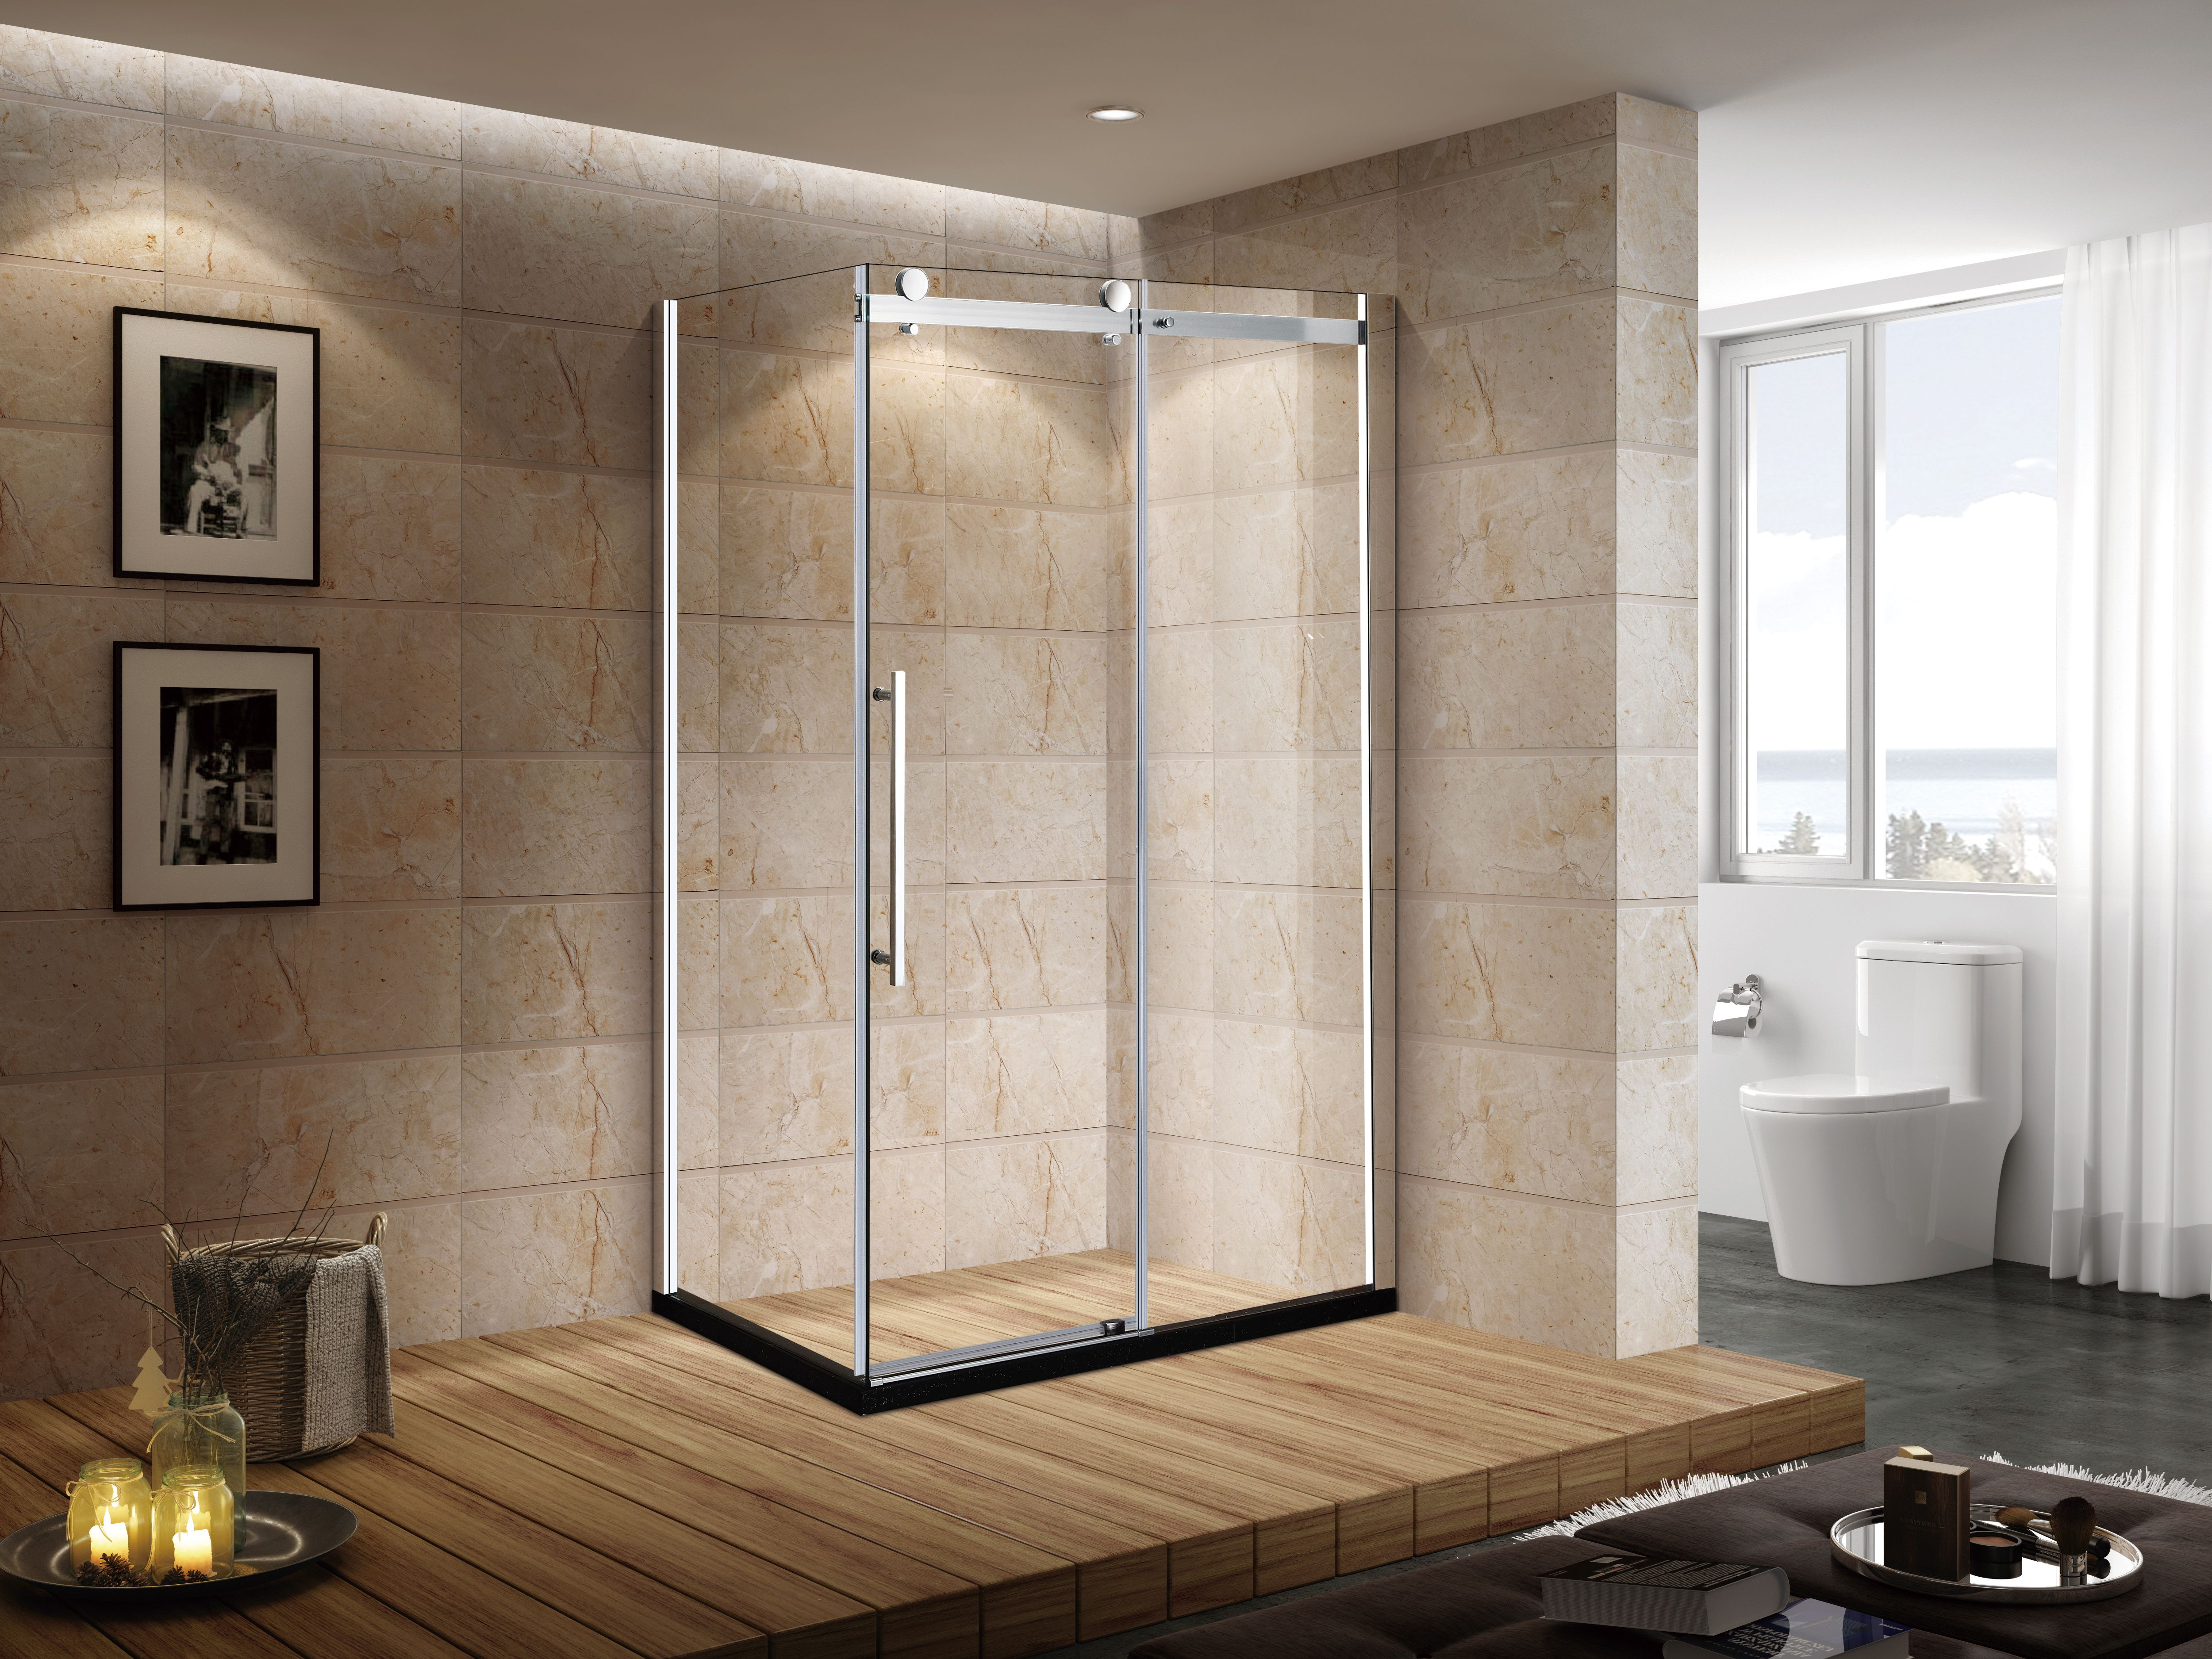 semiframe r85 bathroom double vanity small bathroom cabinets